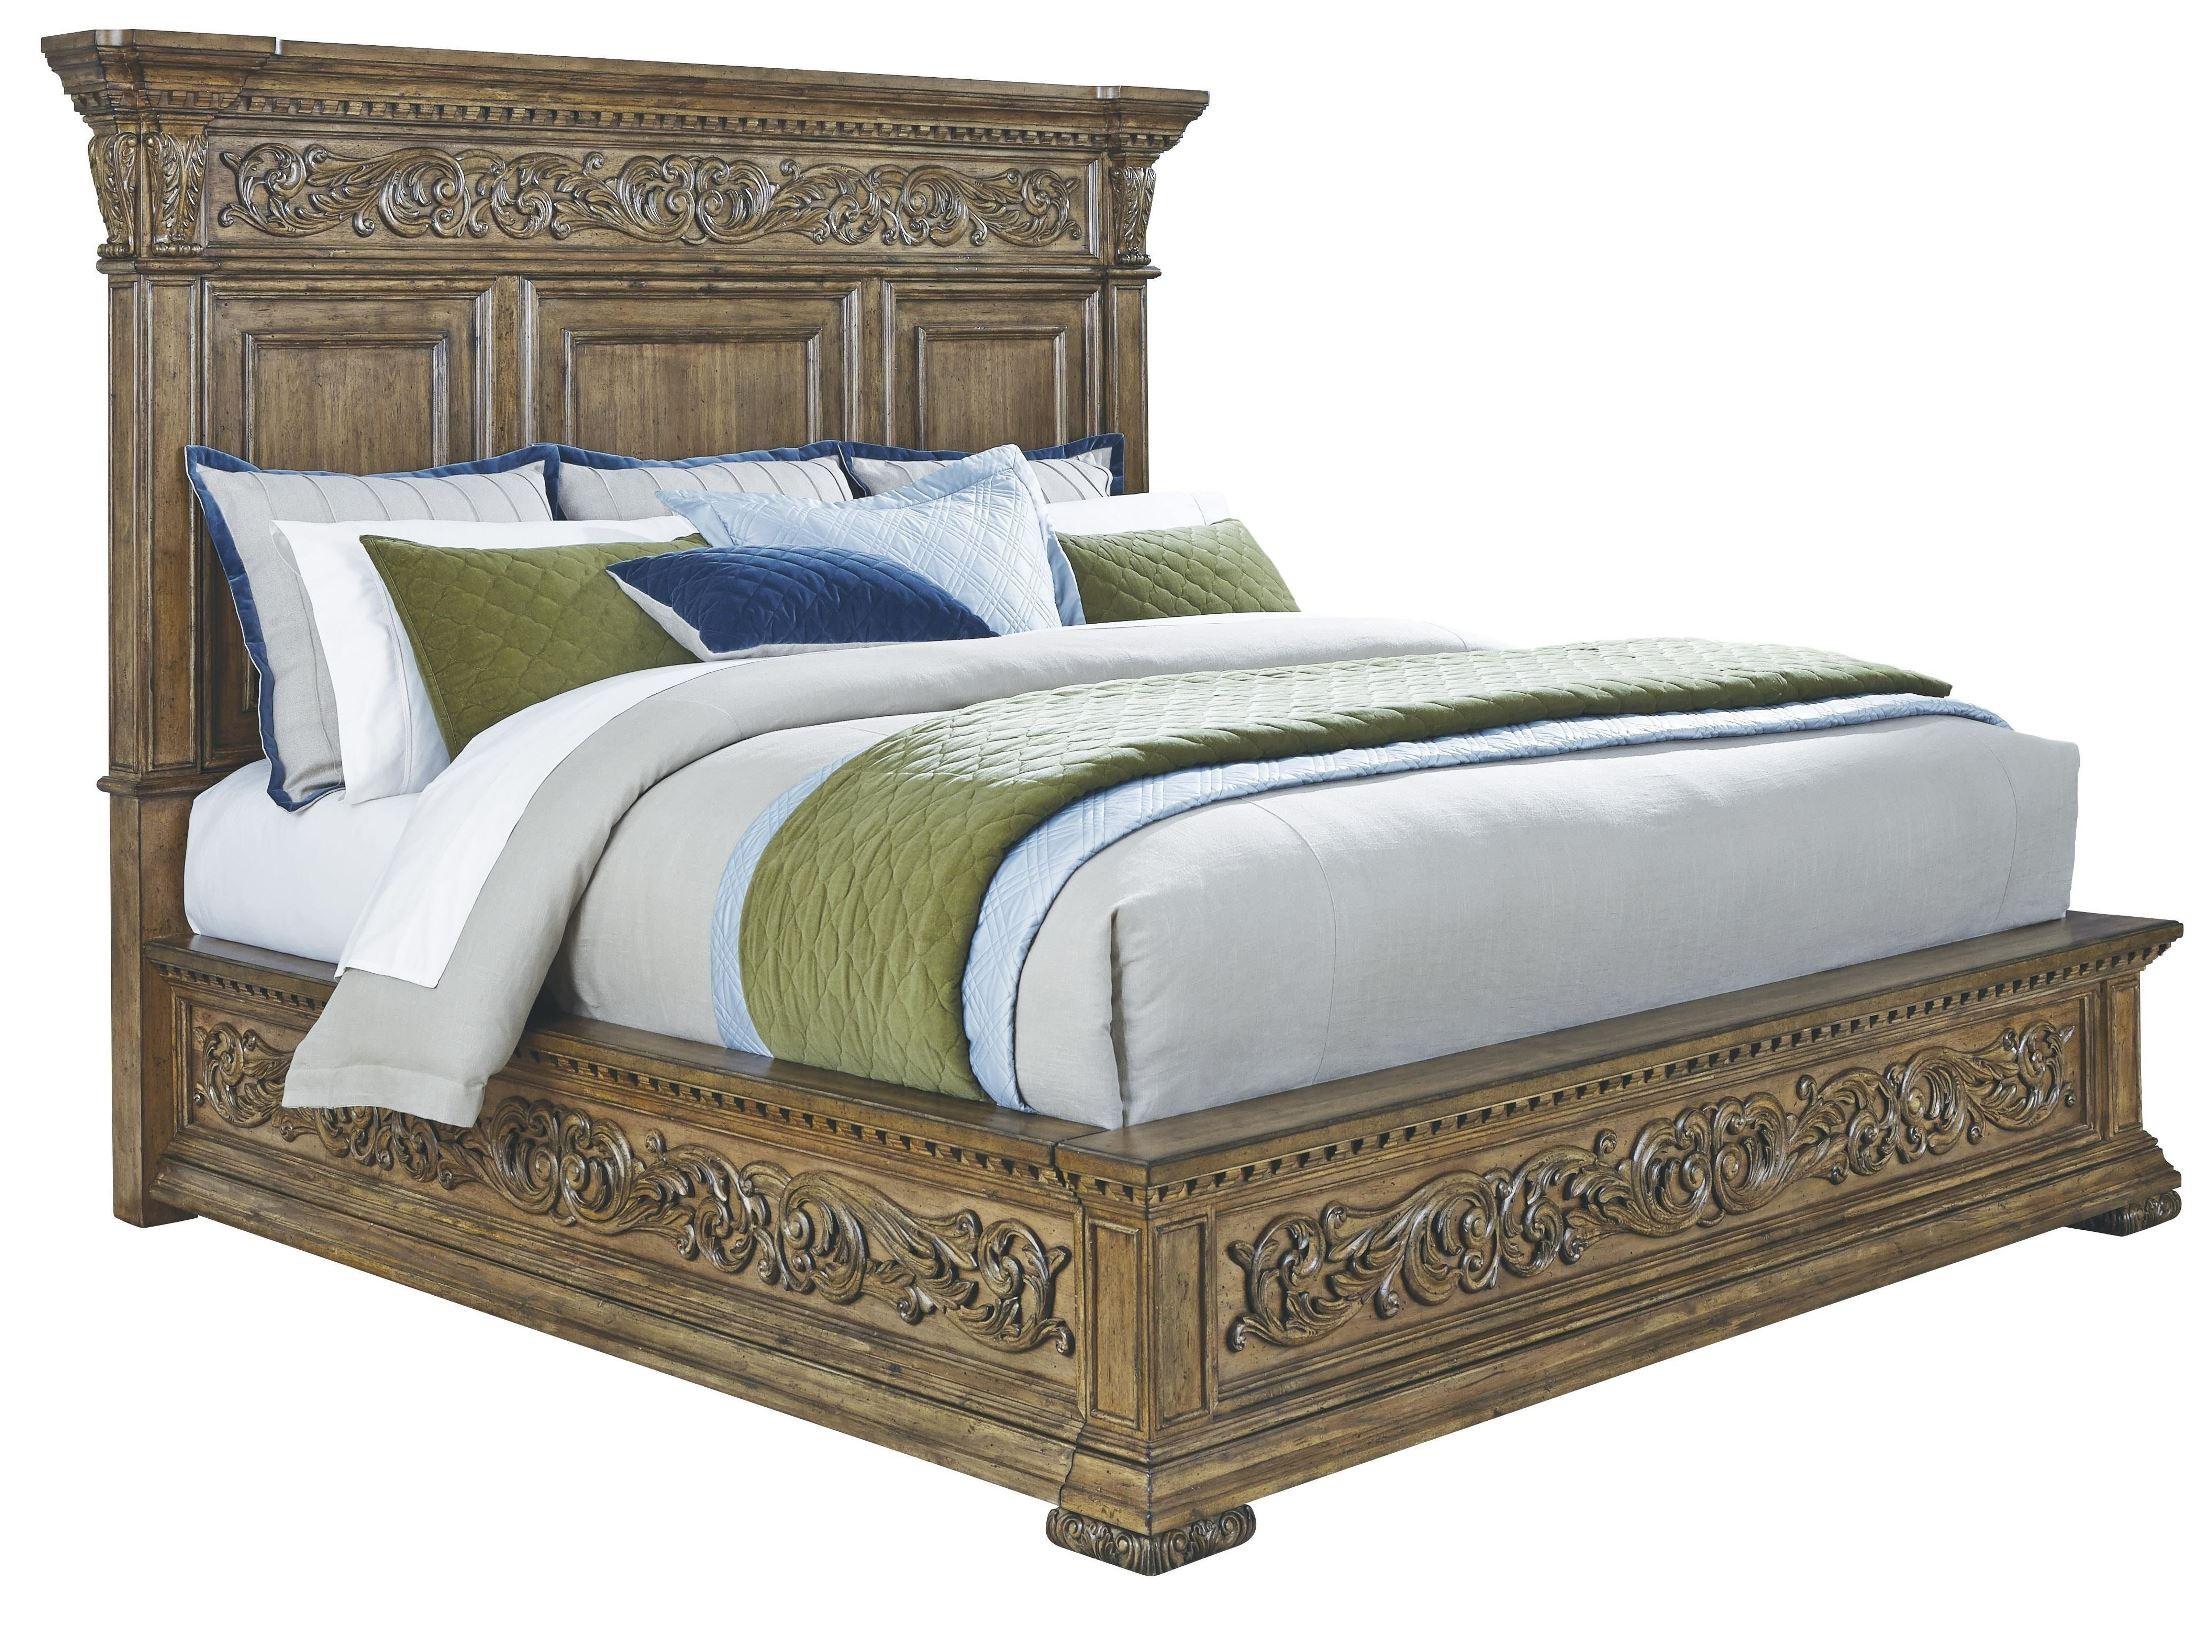 Queen Platform Bed From Pulaski  Coleman Furniture